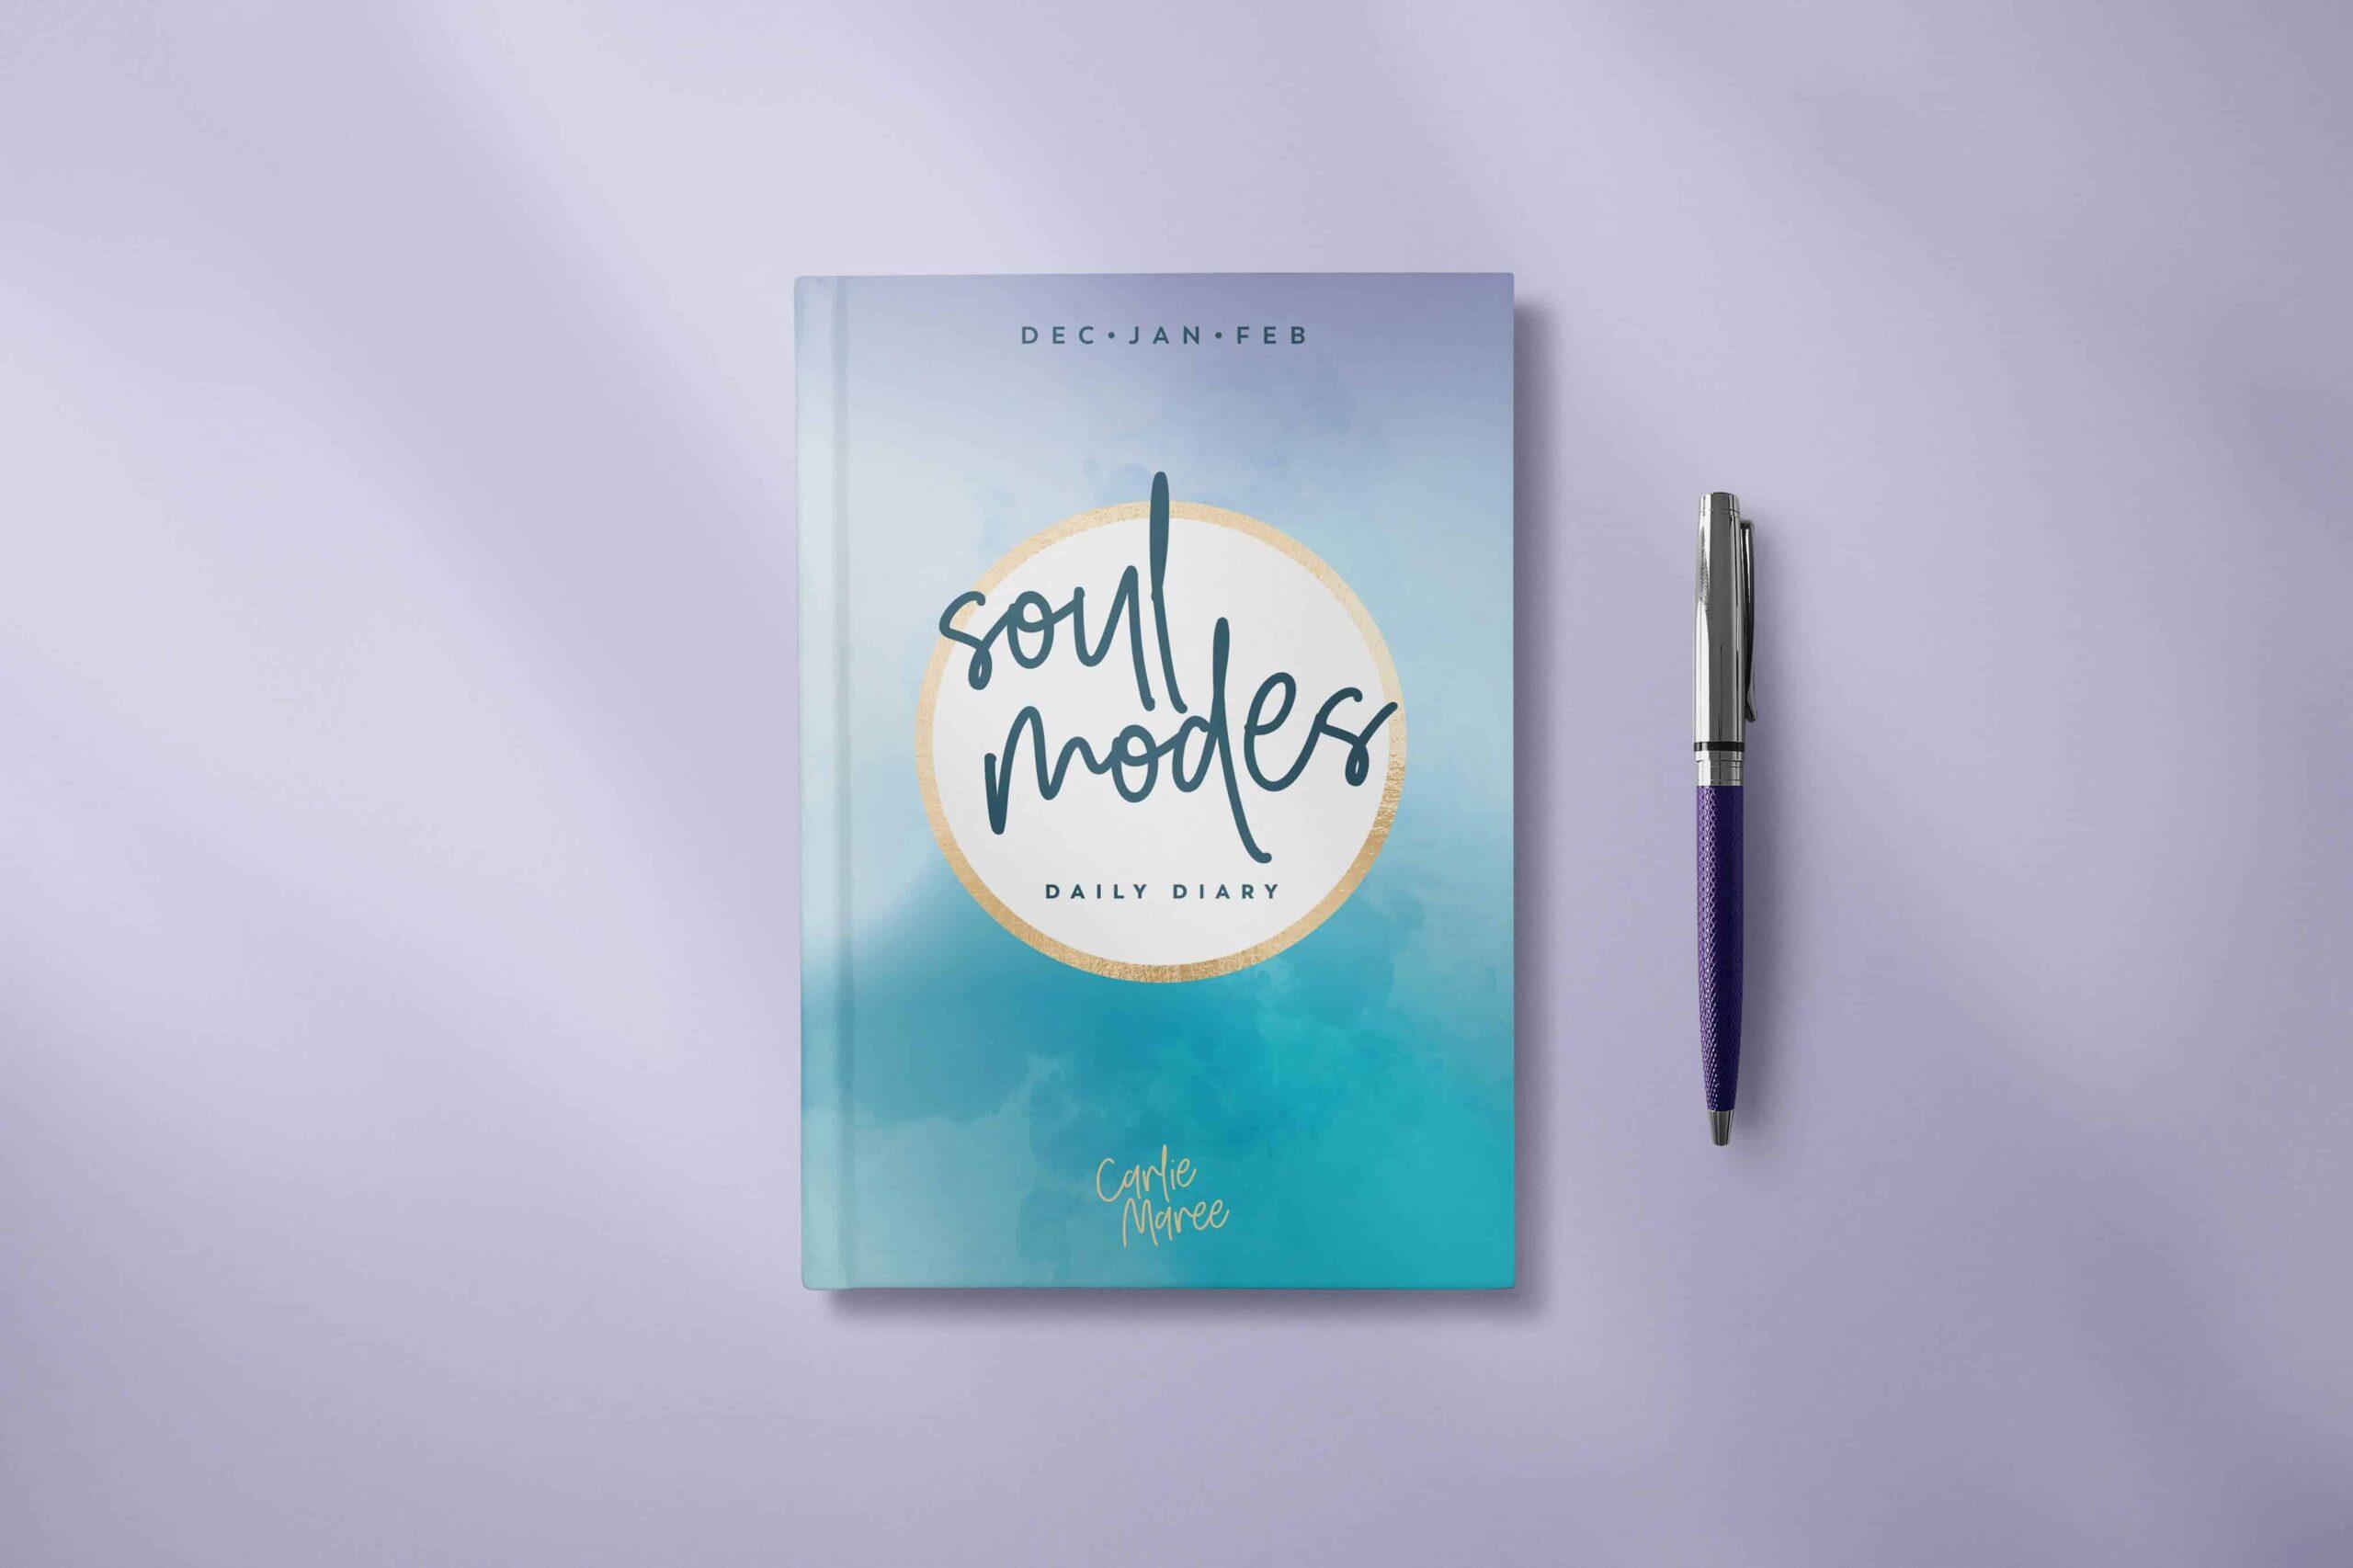 Soul modes diary